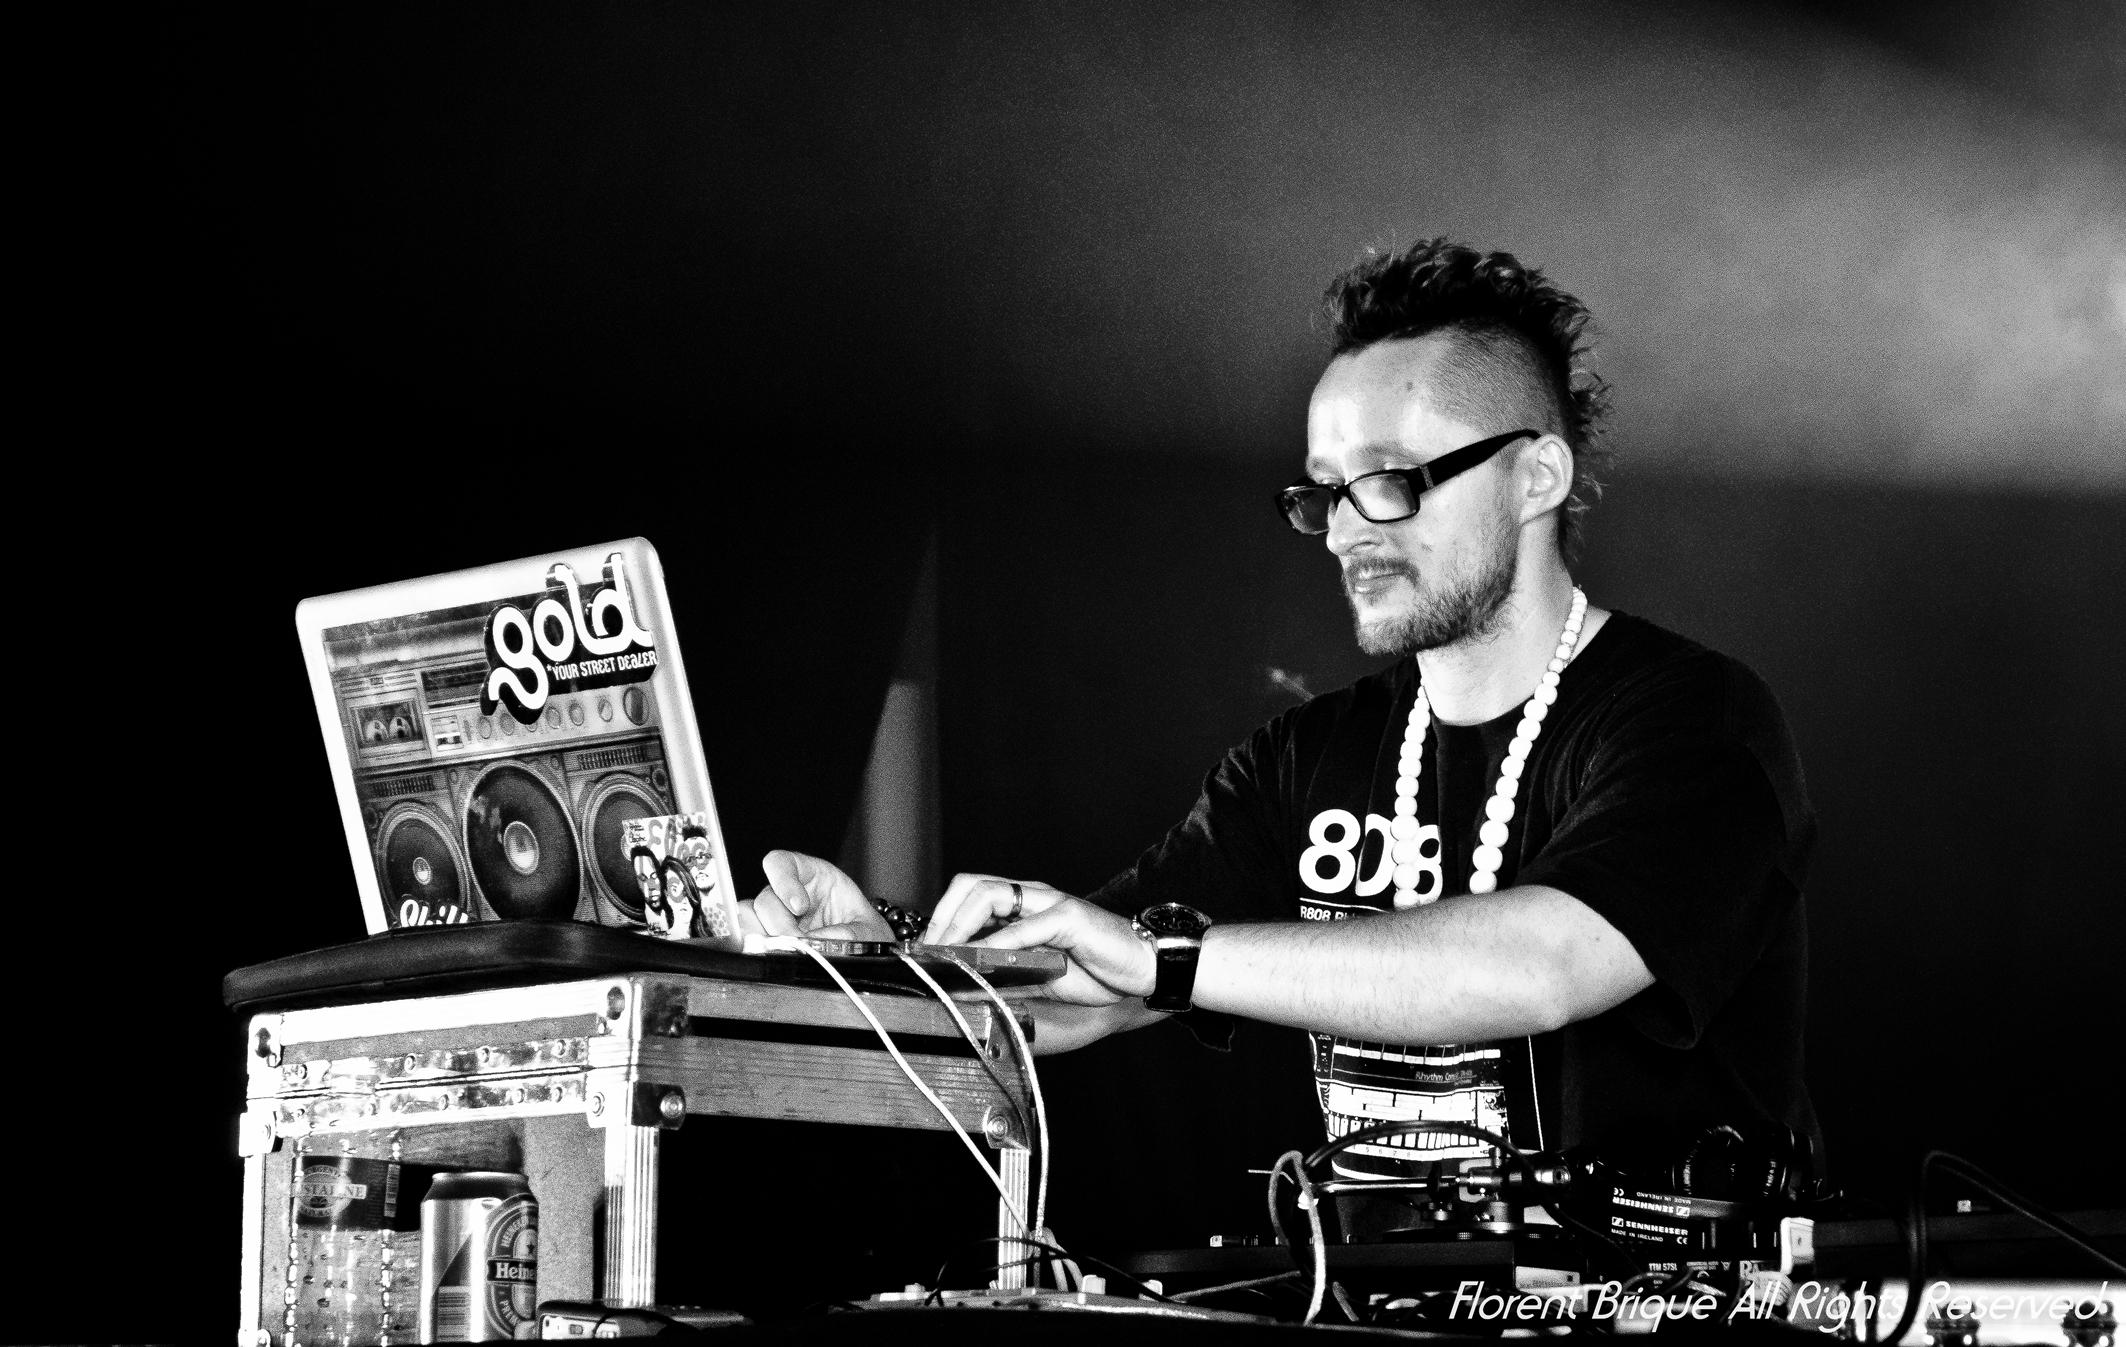 DJ VADIM – Any time